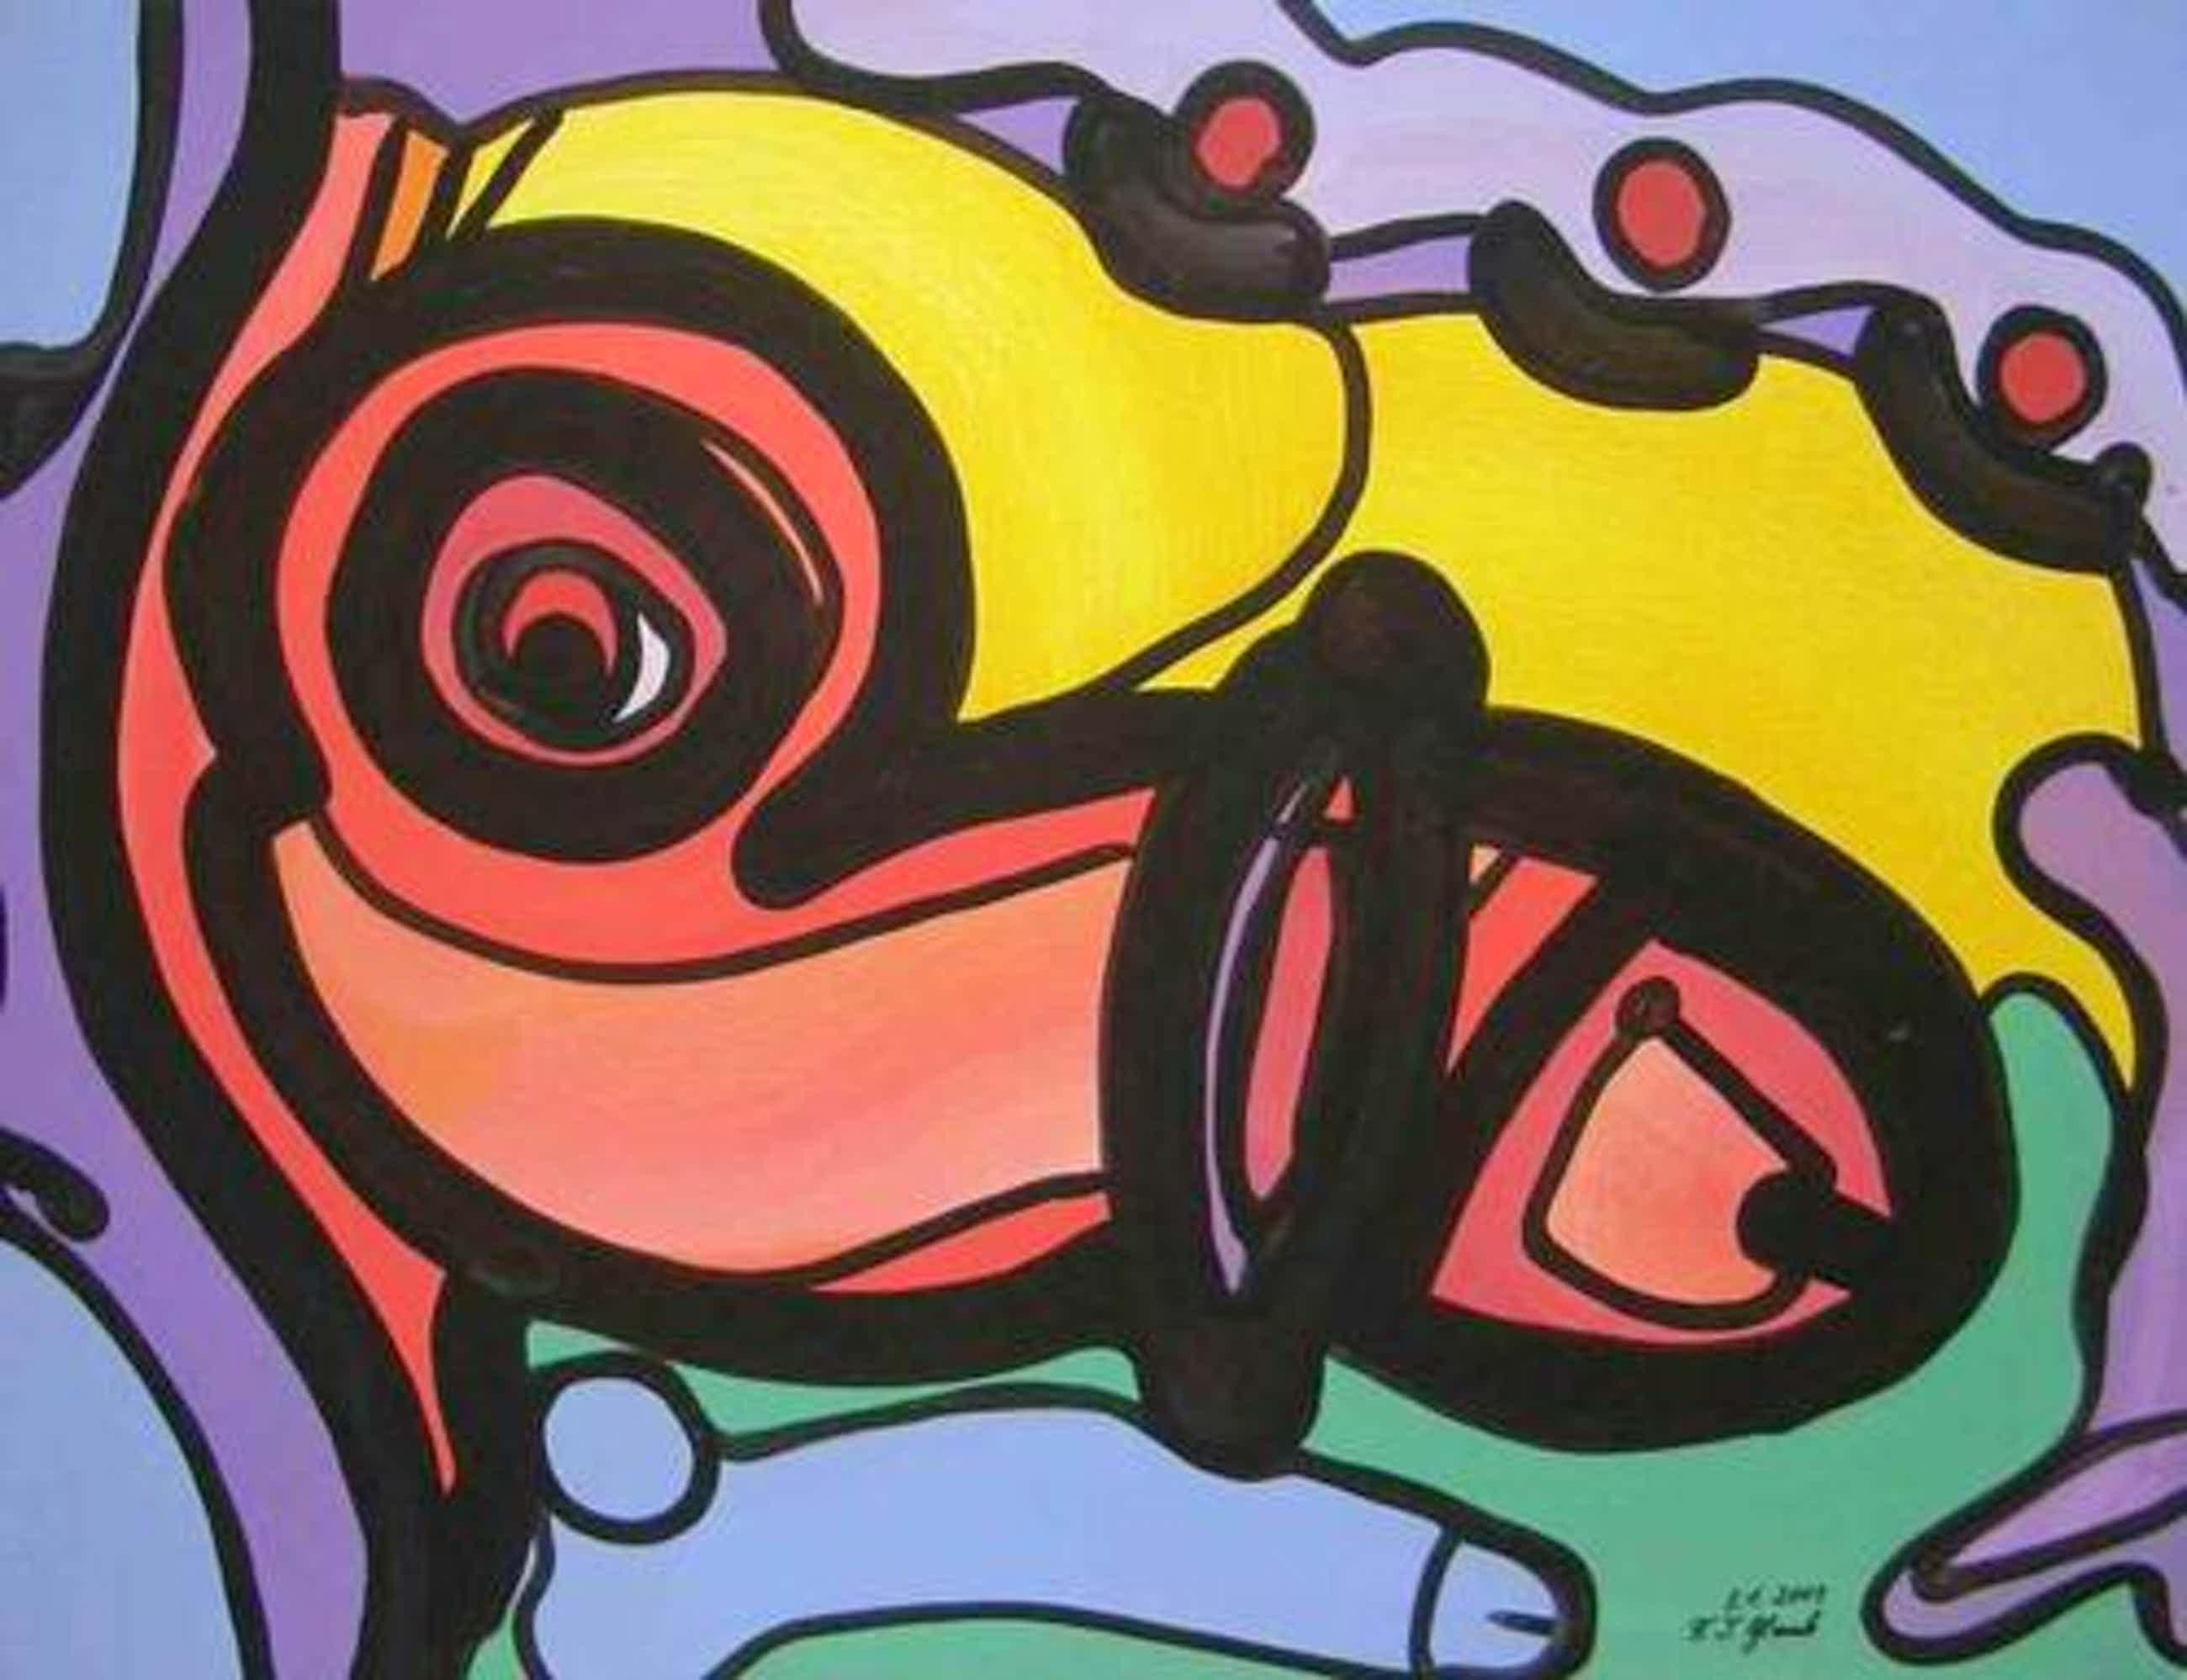 Franz J. Blank - PHALLUS DEI - Grosse POP-ART Acrylmalerei - Handsigniert 2003 (Extravaganza Florida - VISIONEN 2001) kopen? Bied vanaf 110!